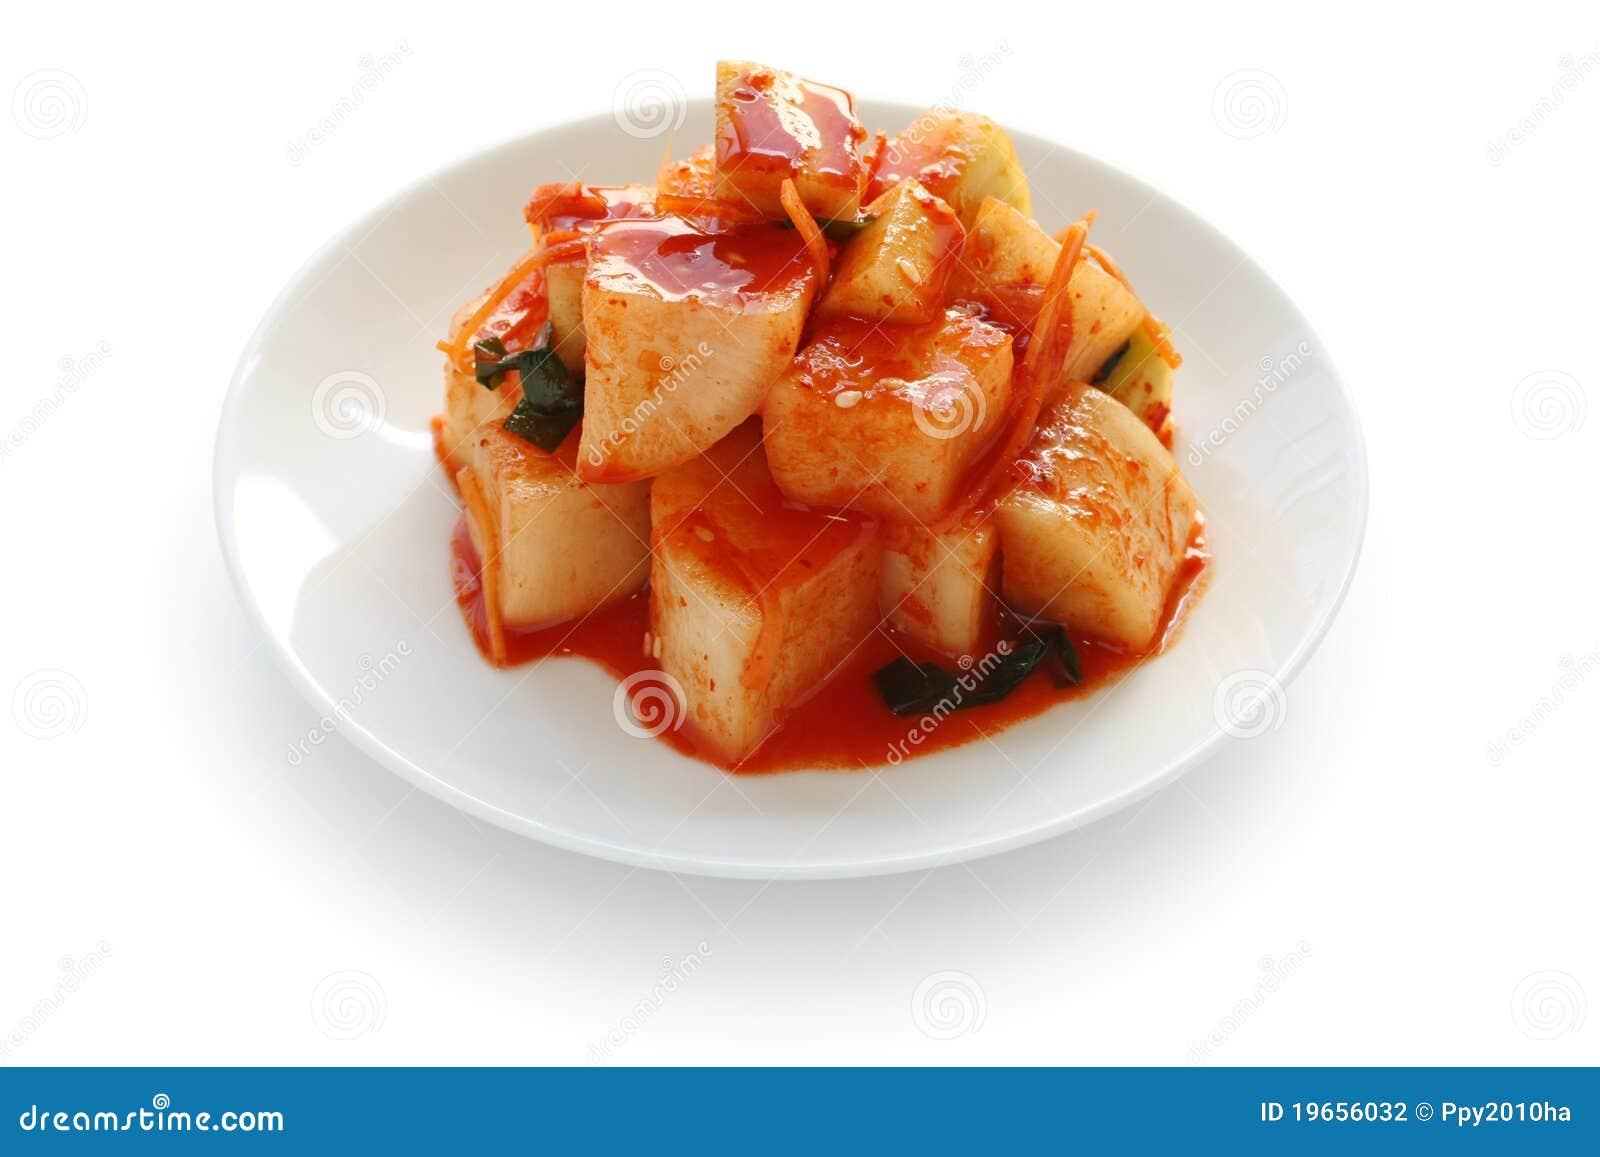 Radish Kimchi Korean Food Stock Photo Image Of